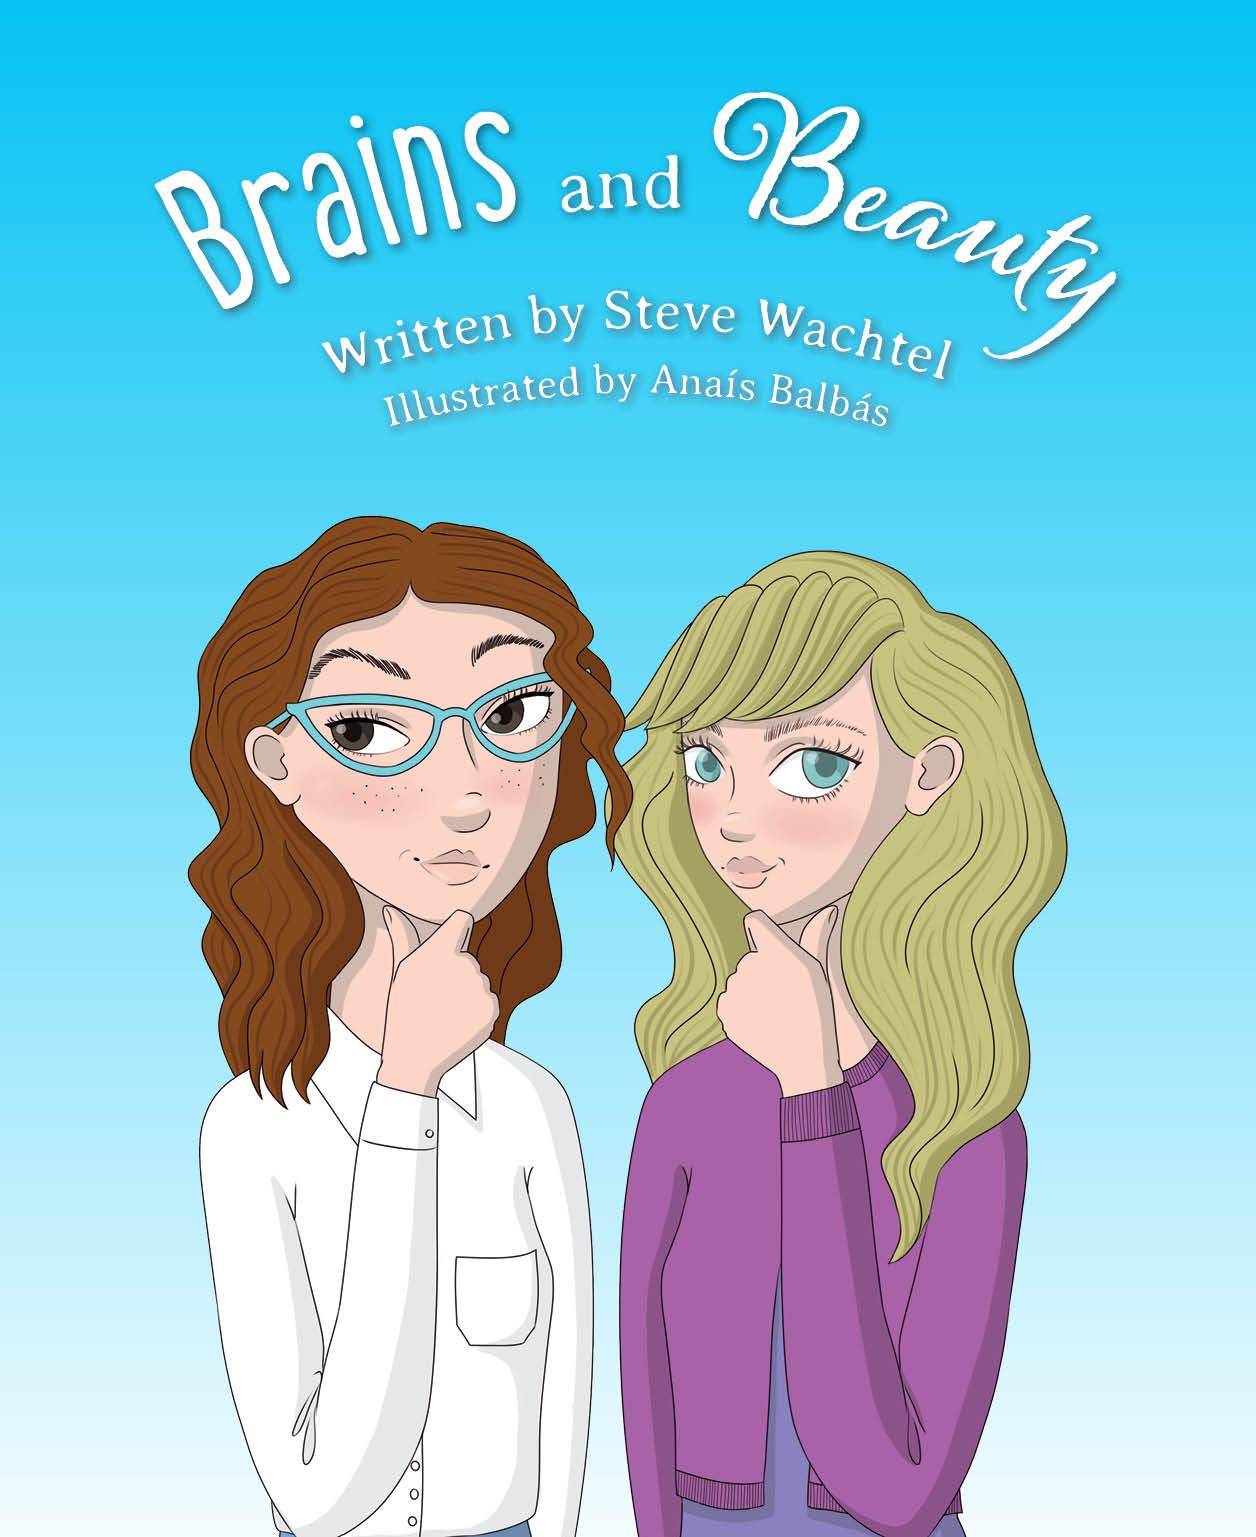 BrainsAndBeauty_Amazon